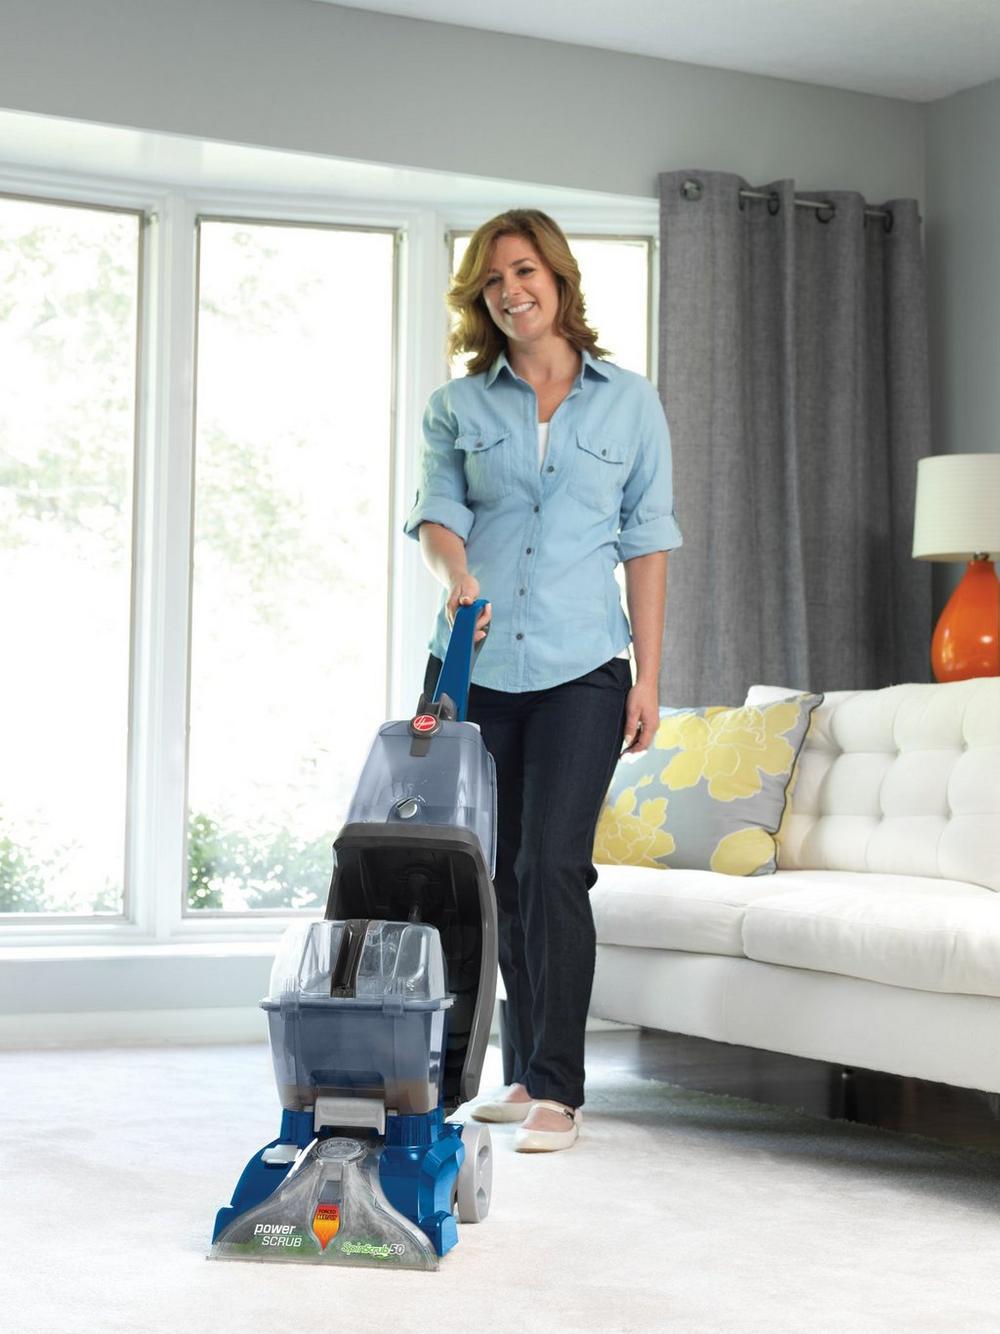 Power Scrub Deluxe Carpet Cleaner3